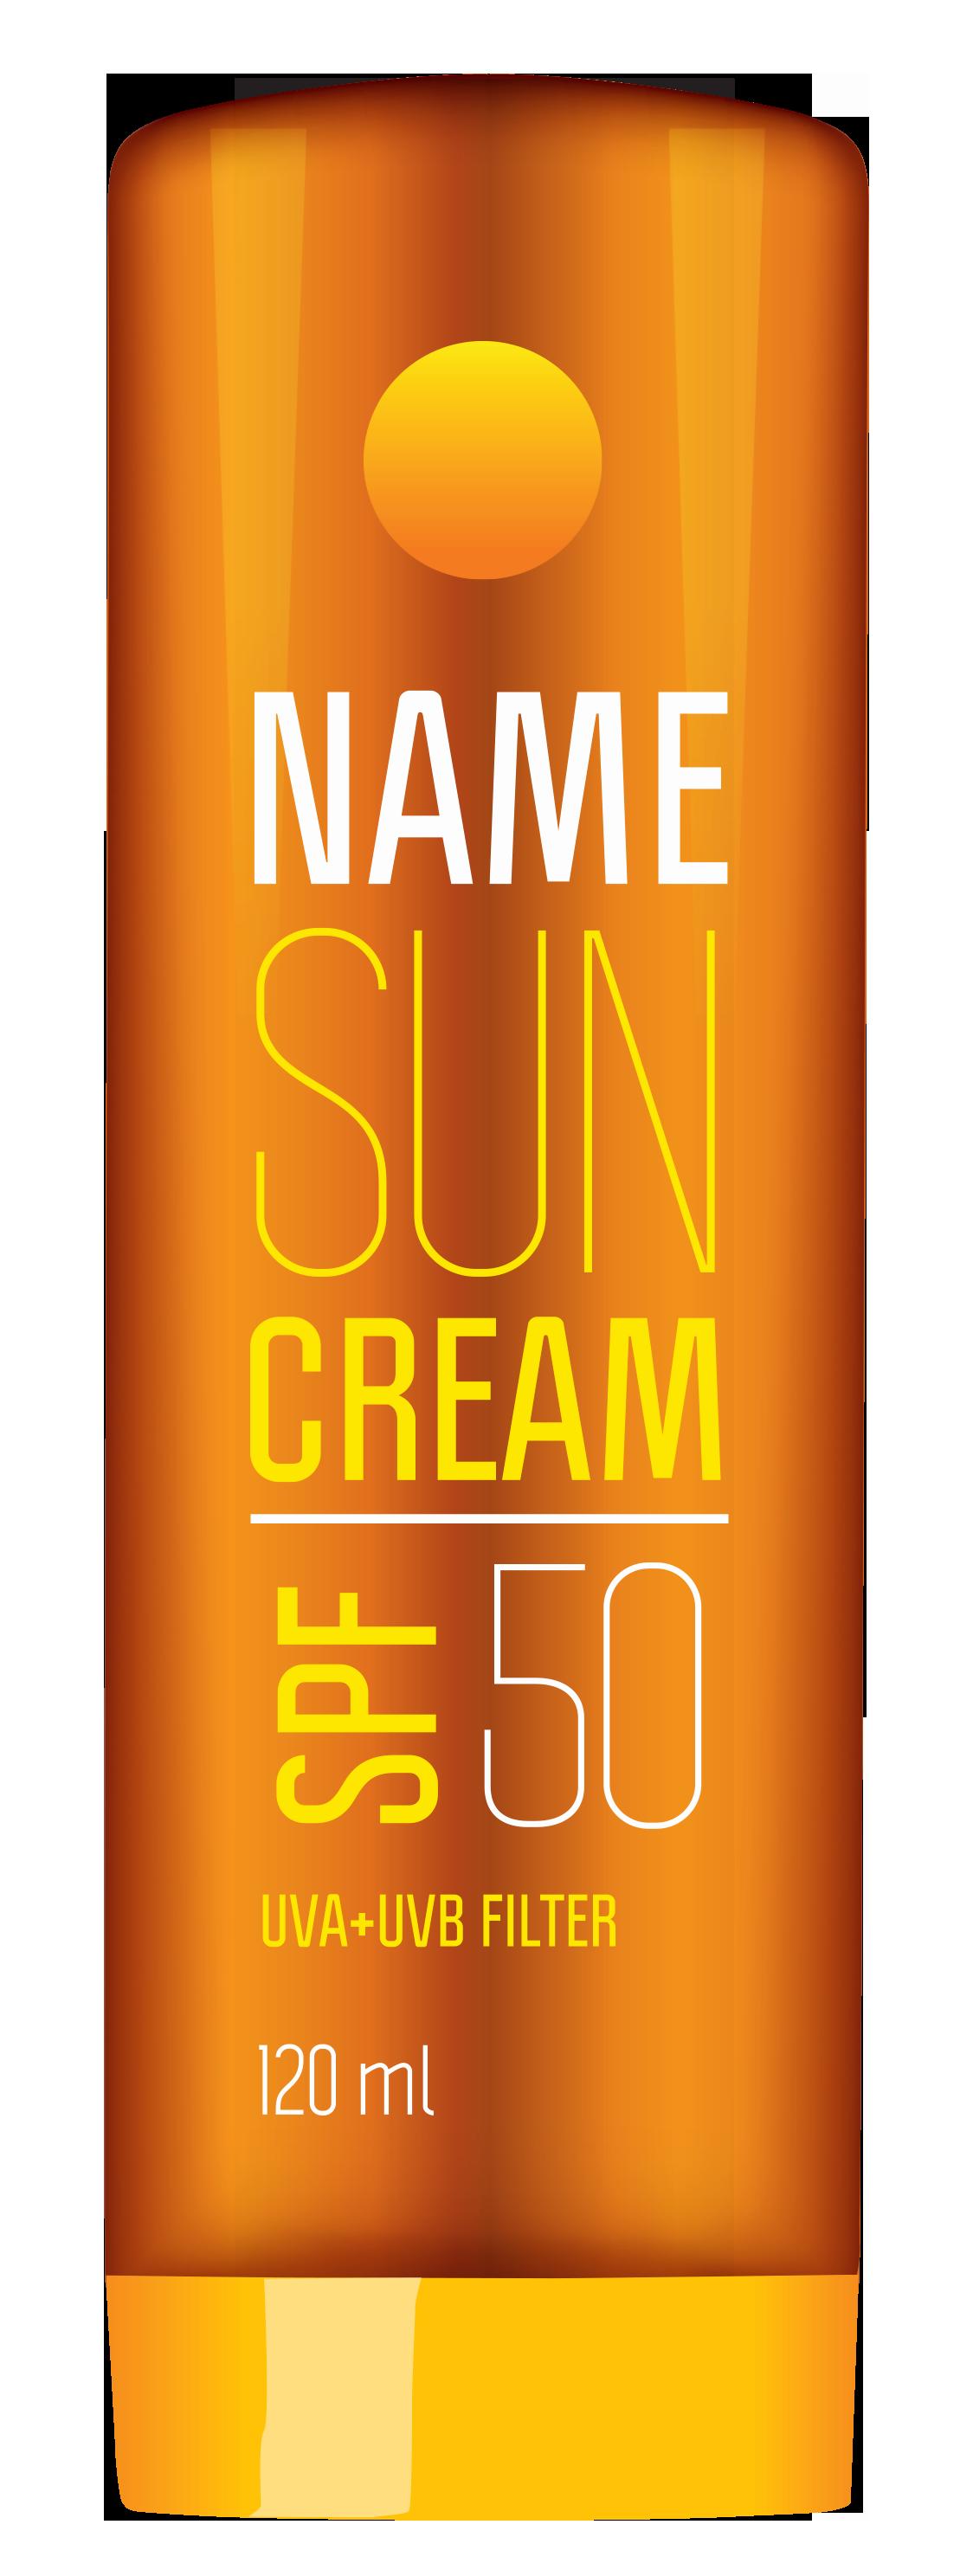 Sun Cream Tube PNG Clipart Picture.